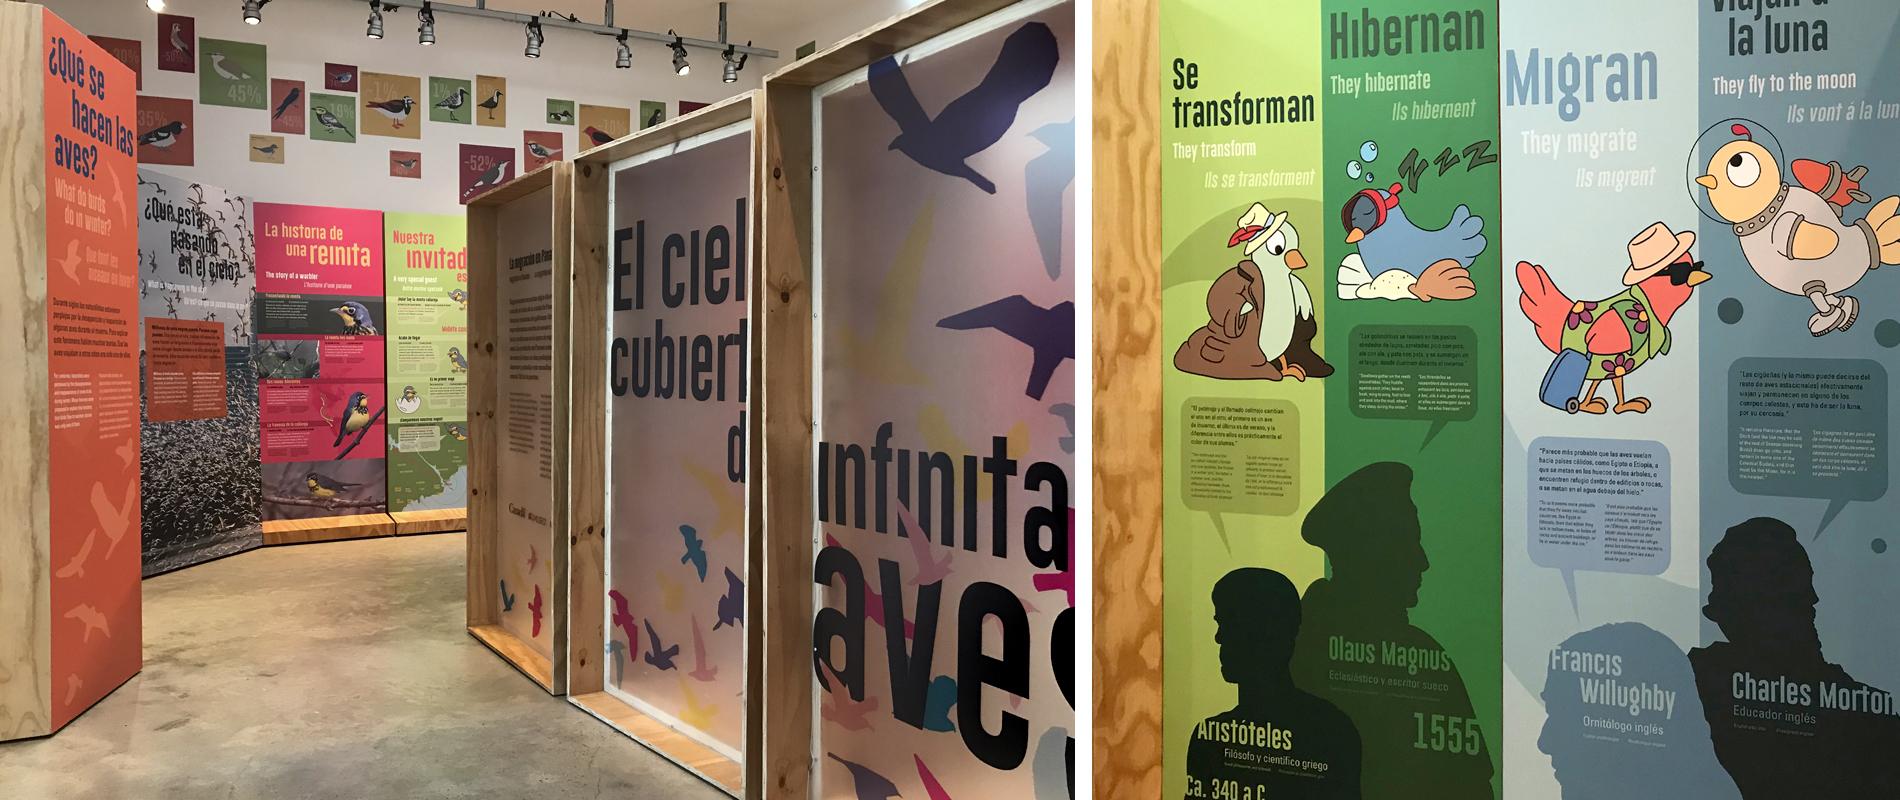 aves_migratorias_orosman_0.jpg